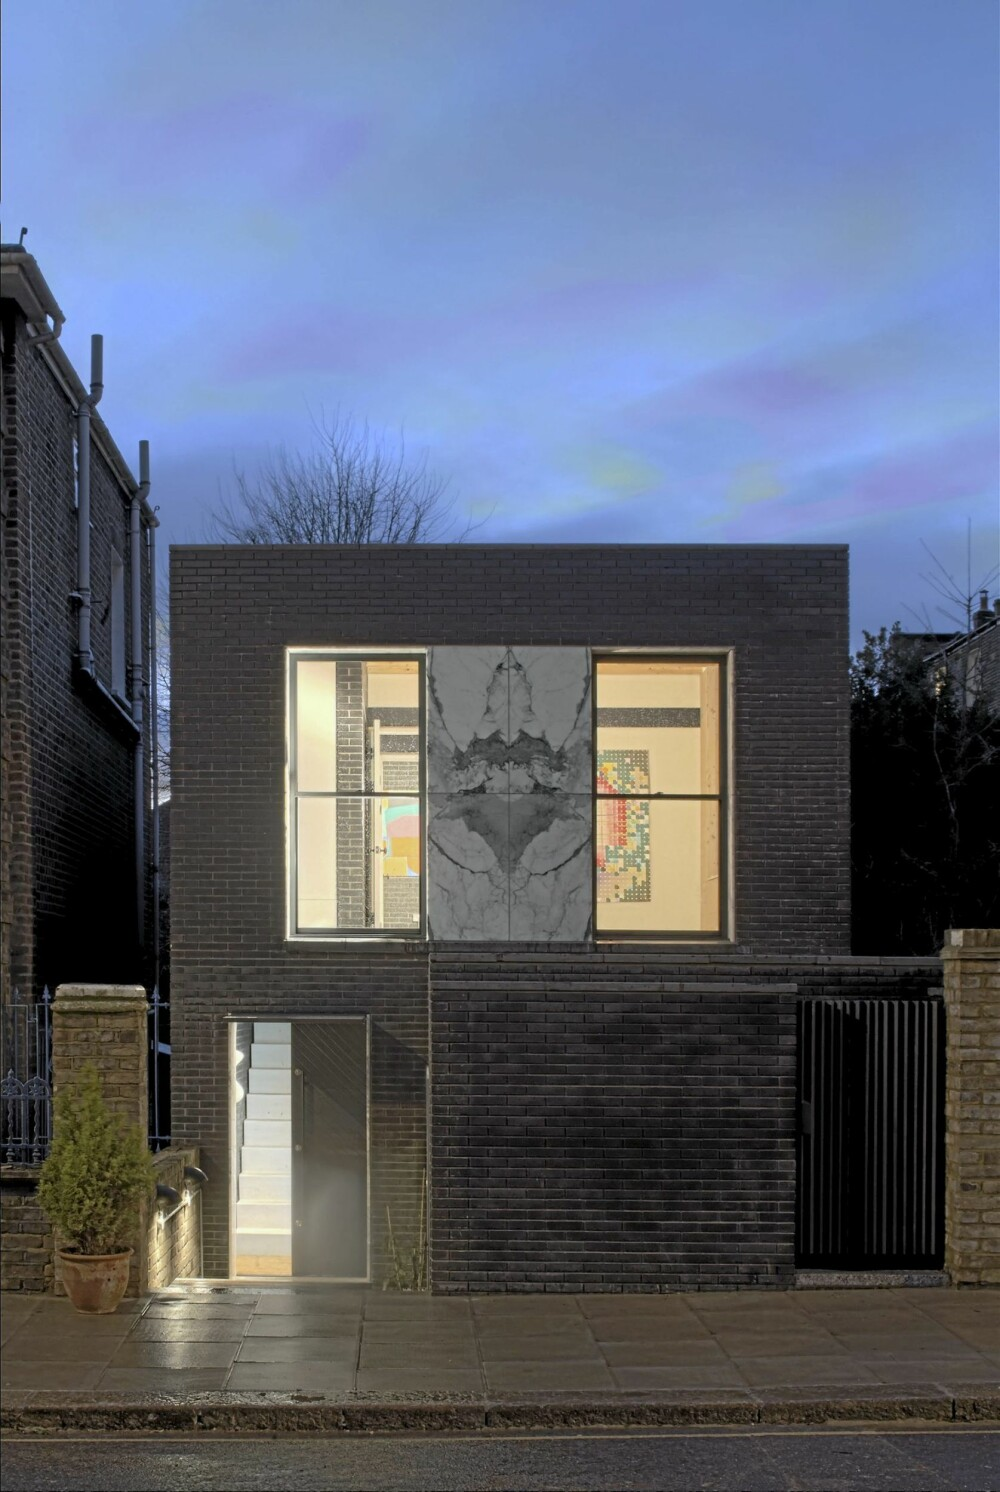 URBAN BELIGGENHET: The Shadow House ligger i Pauls Crescent, London, NW1 9TN. I den sterkt beskyttede Camden Square Conservation Area.